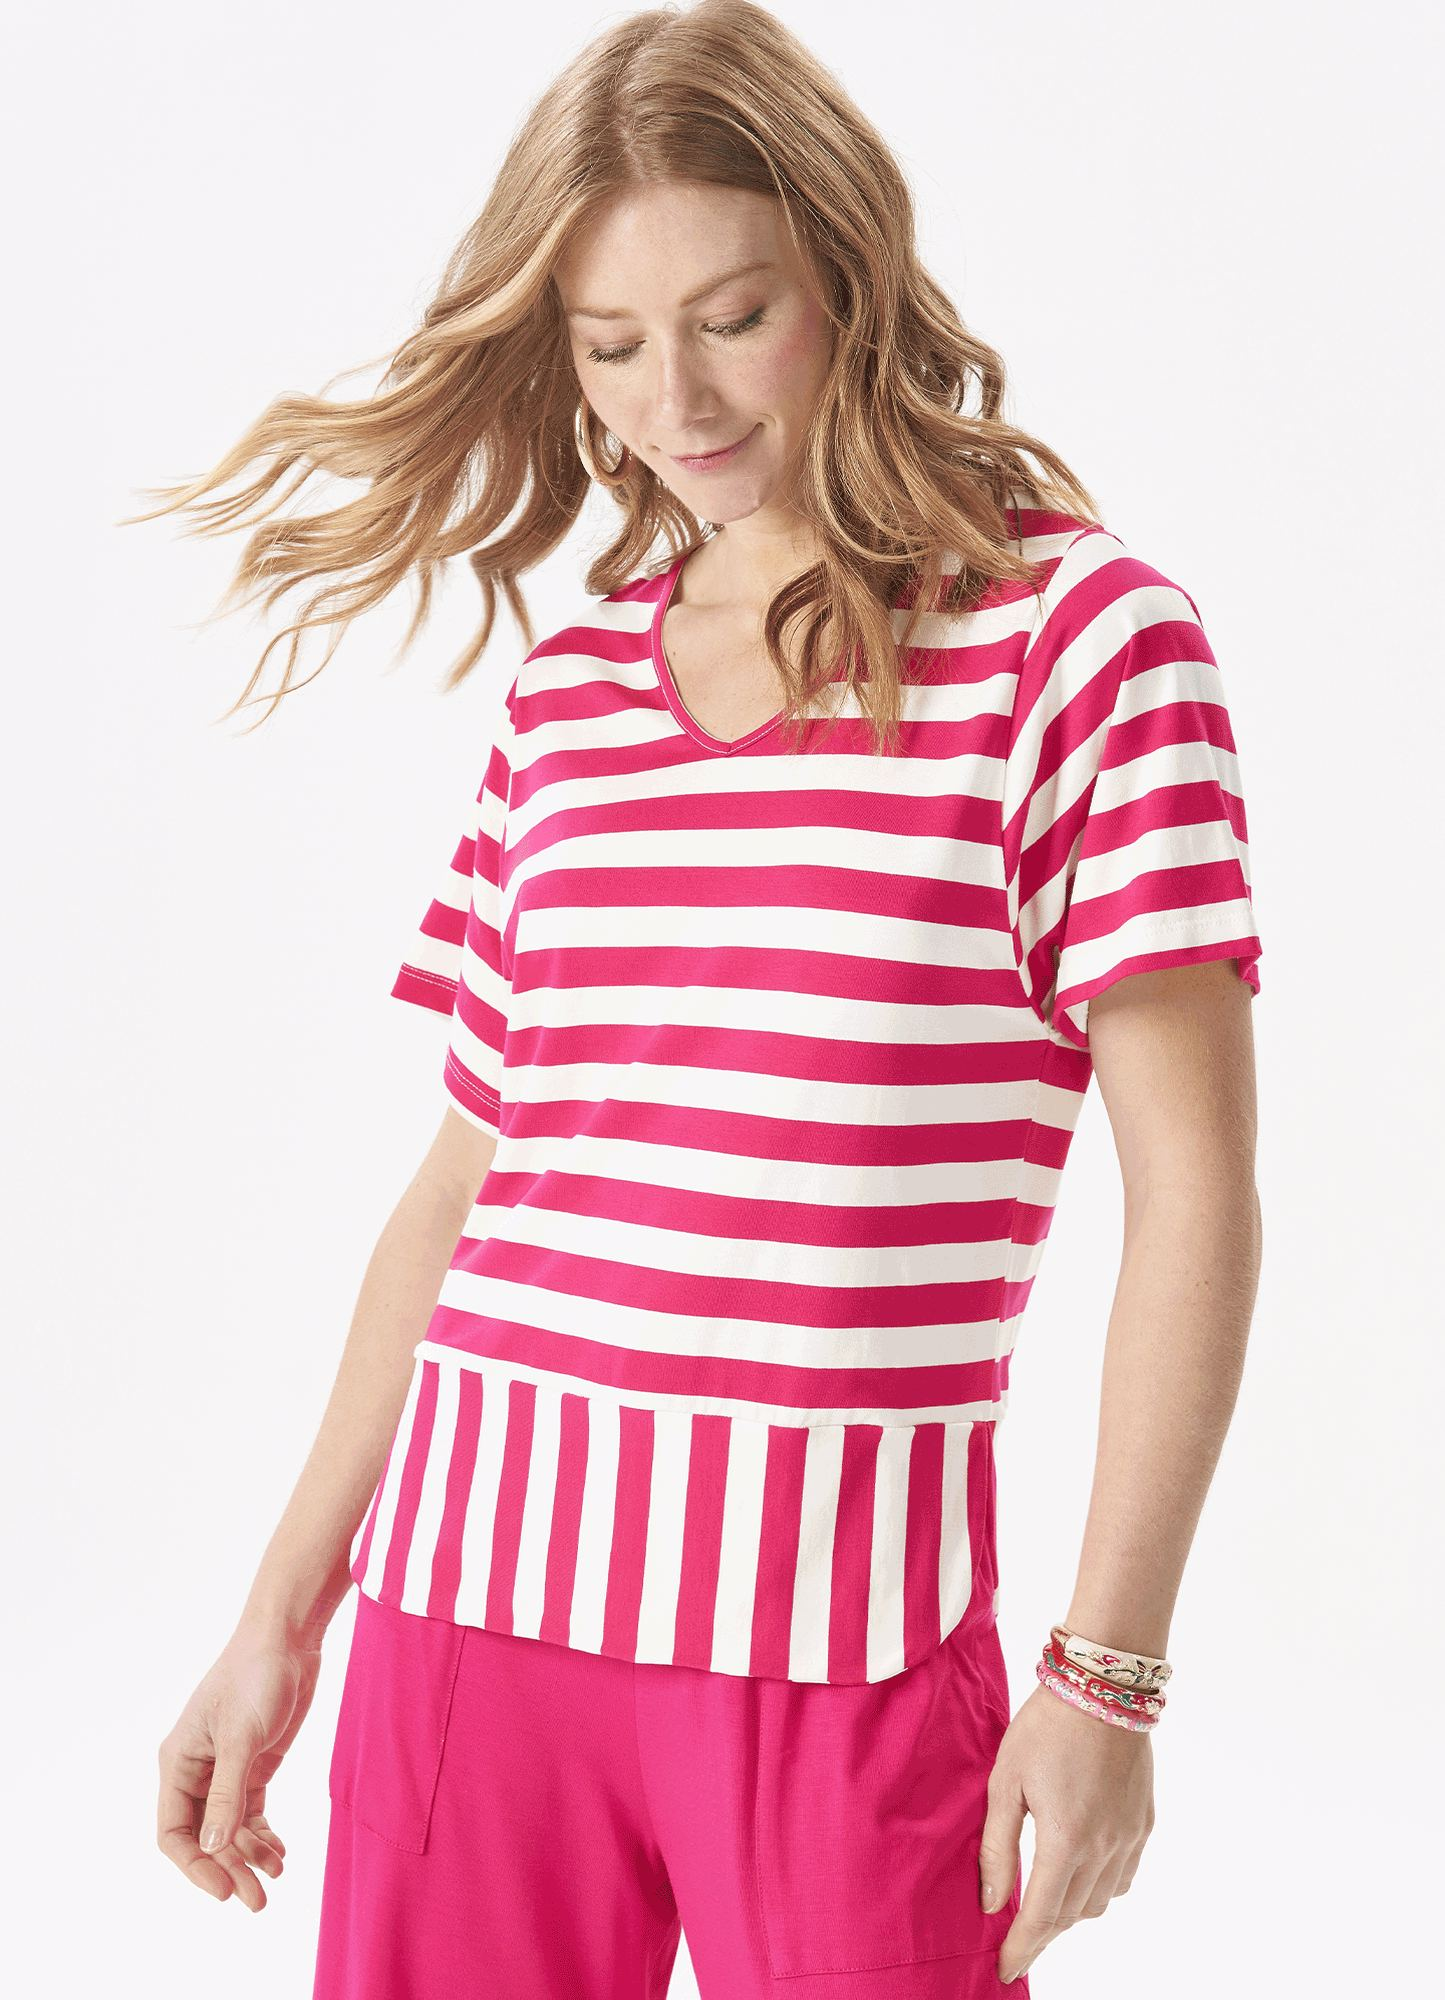 Blusa Feminina Plus Size Malha Rosa Listrada Barra Arredondada